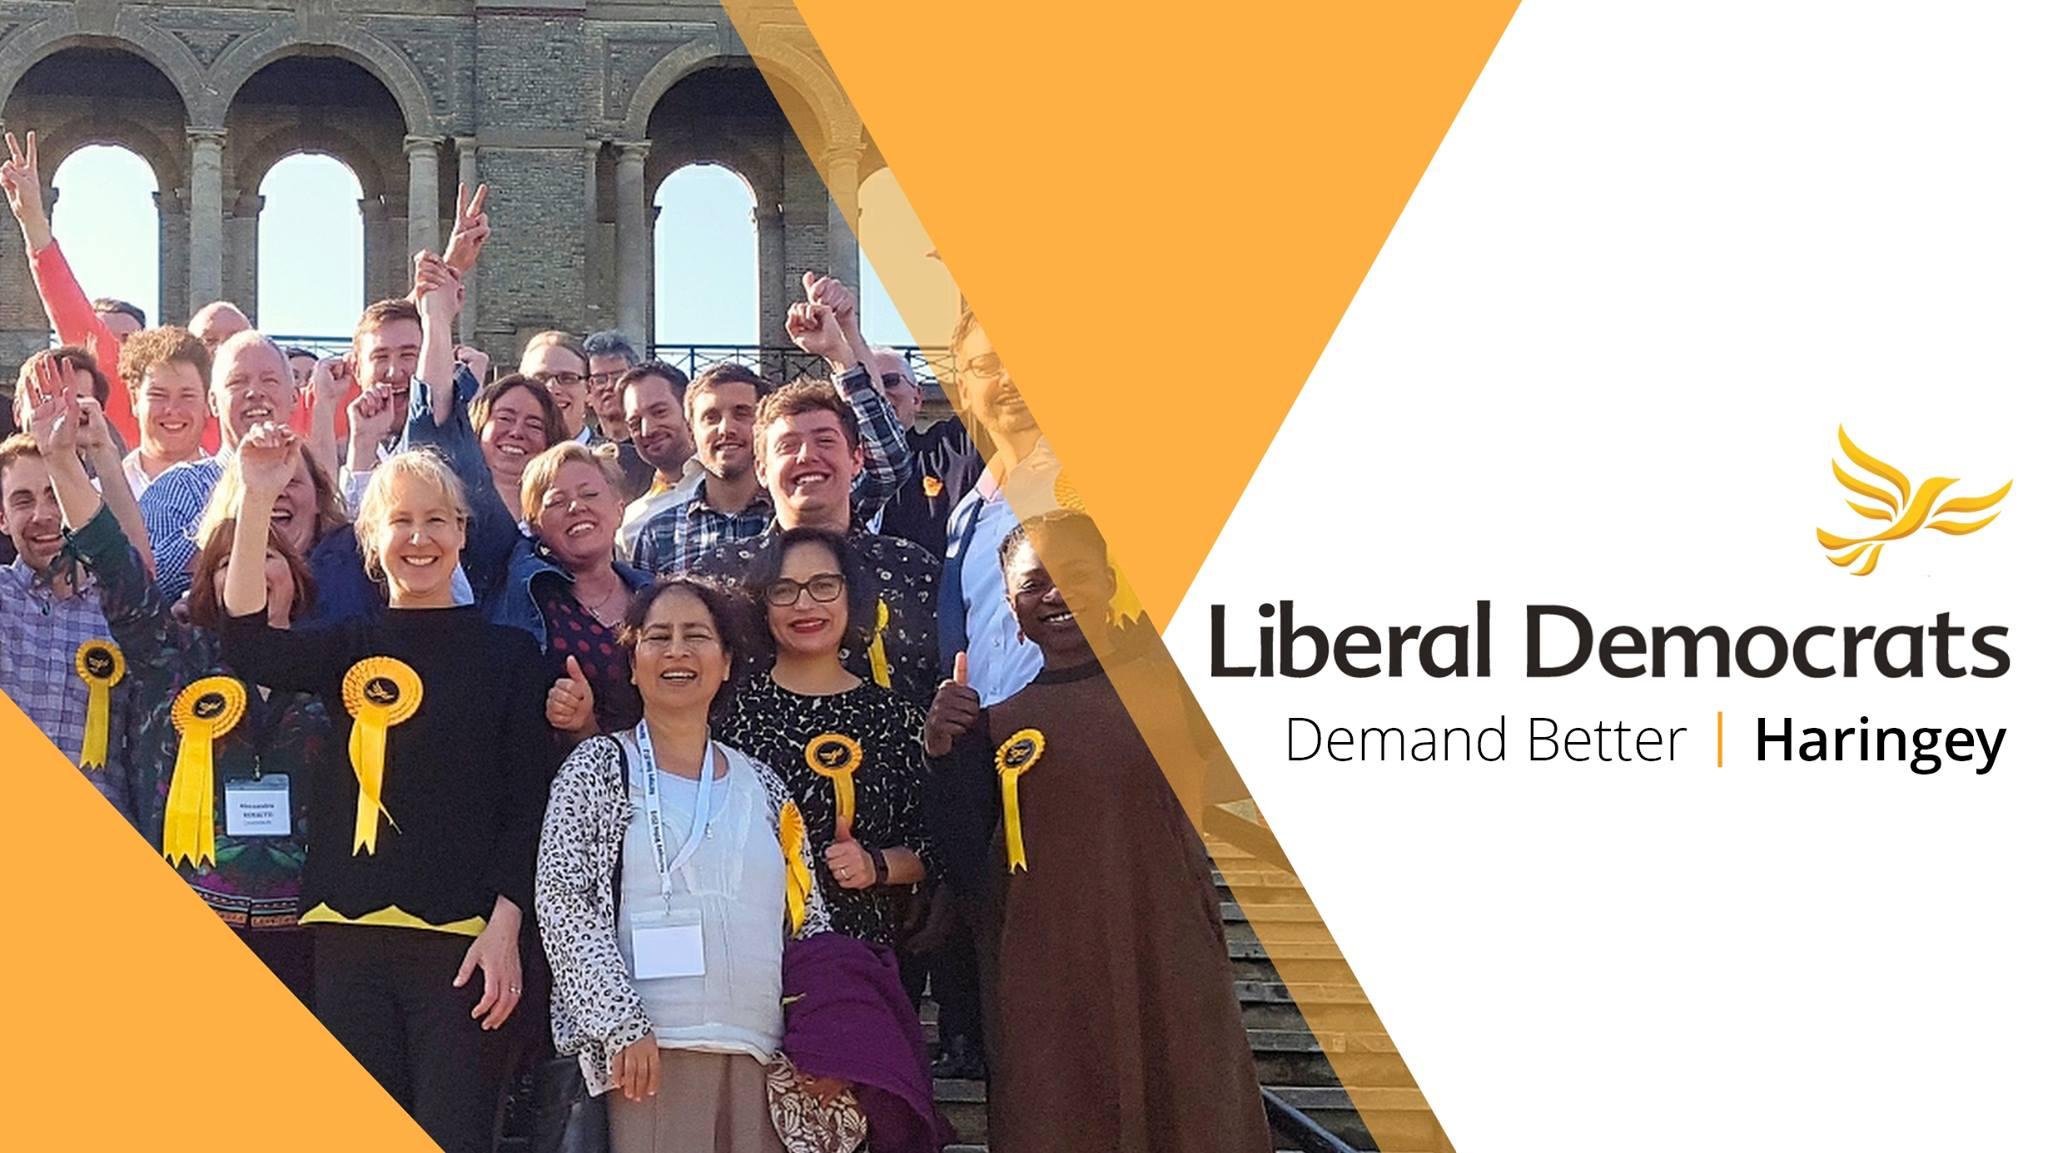 Haringey Liberal Democrats